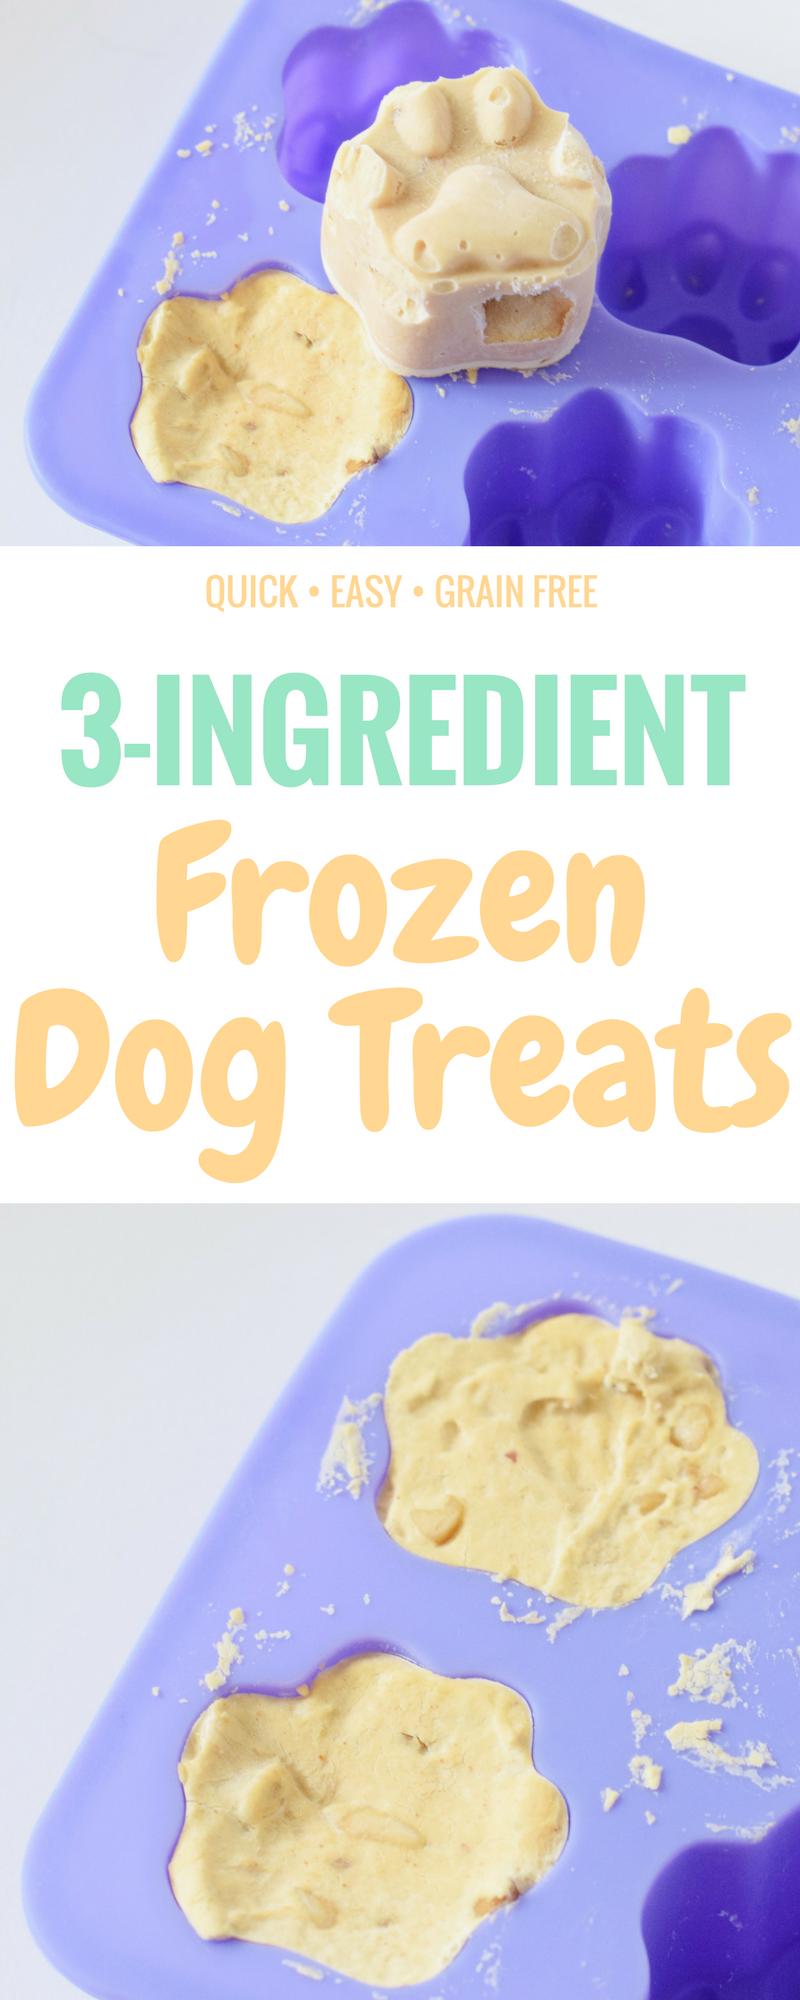 DIY Frosty Paw Dog Treats - 3 Ingredient Dog Treat Recipe - Dog Treat Peanut Butter - Frozen Dog Treat Recipe - Grain Free Homemade Dog Treats - Homemade Frosty Paws - Easy Dog Treat Recipe - Communikait by Kait Hanson